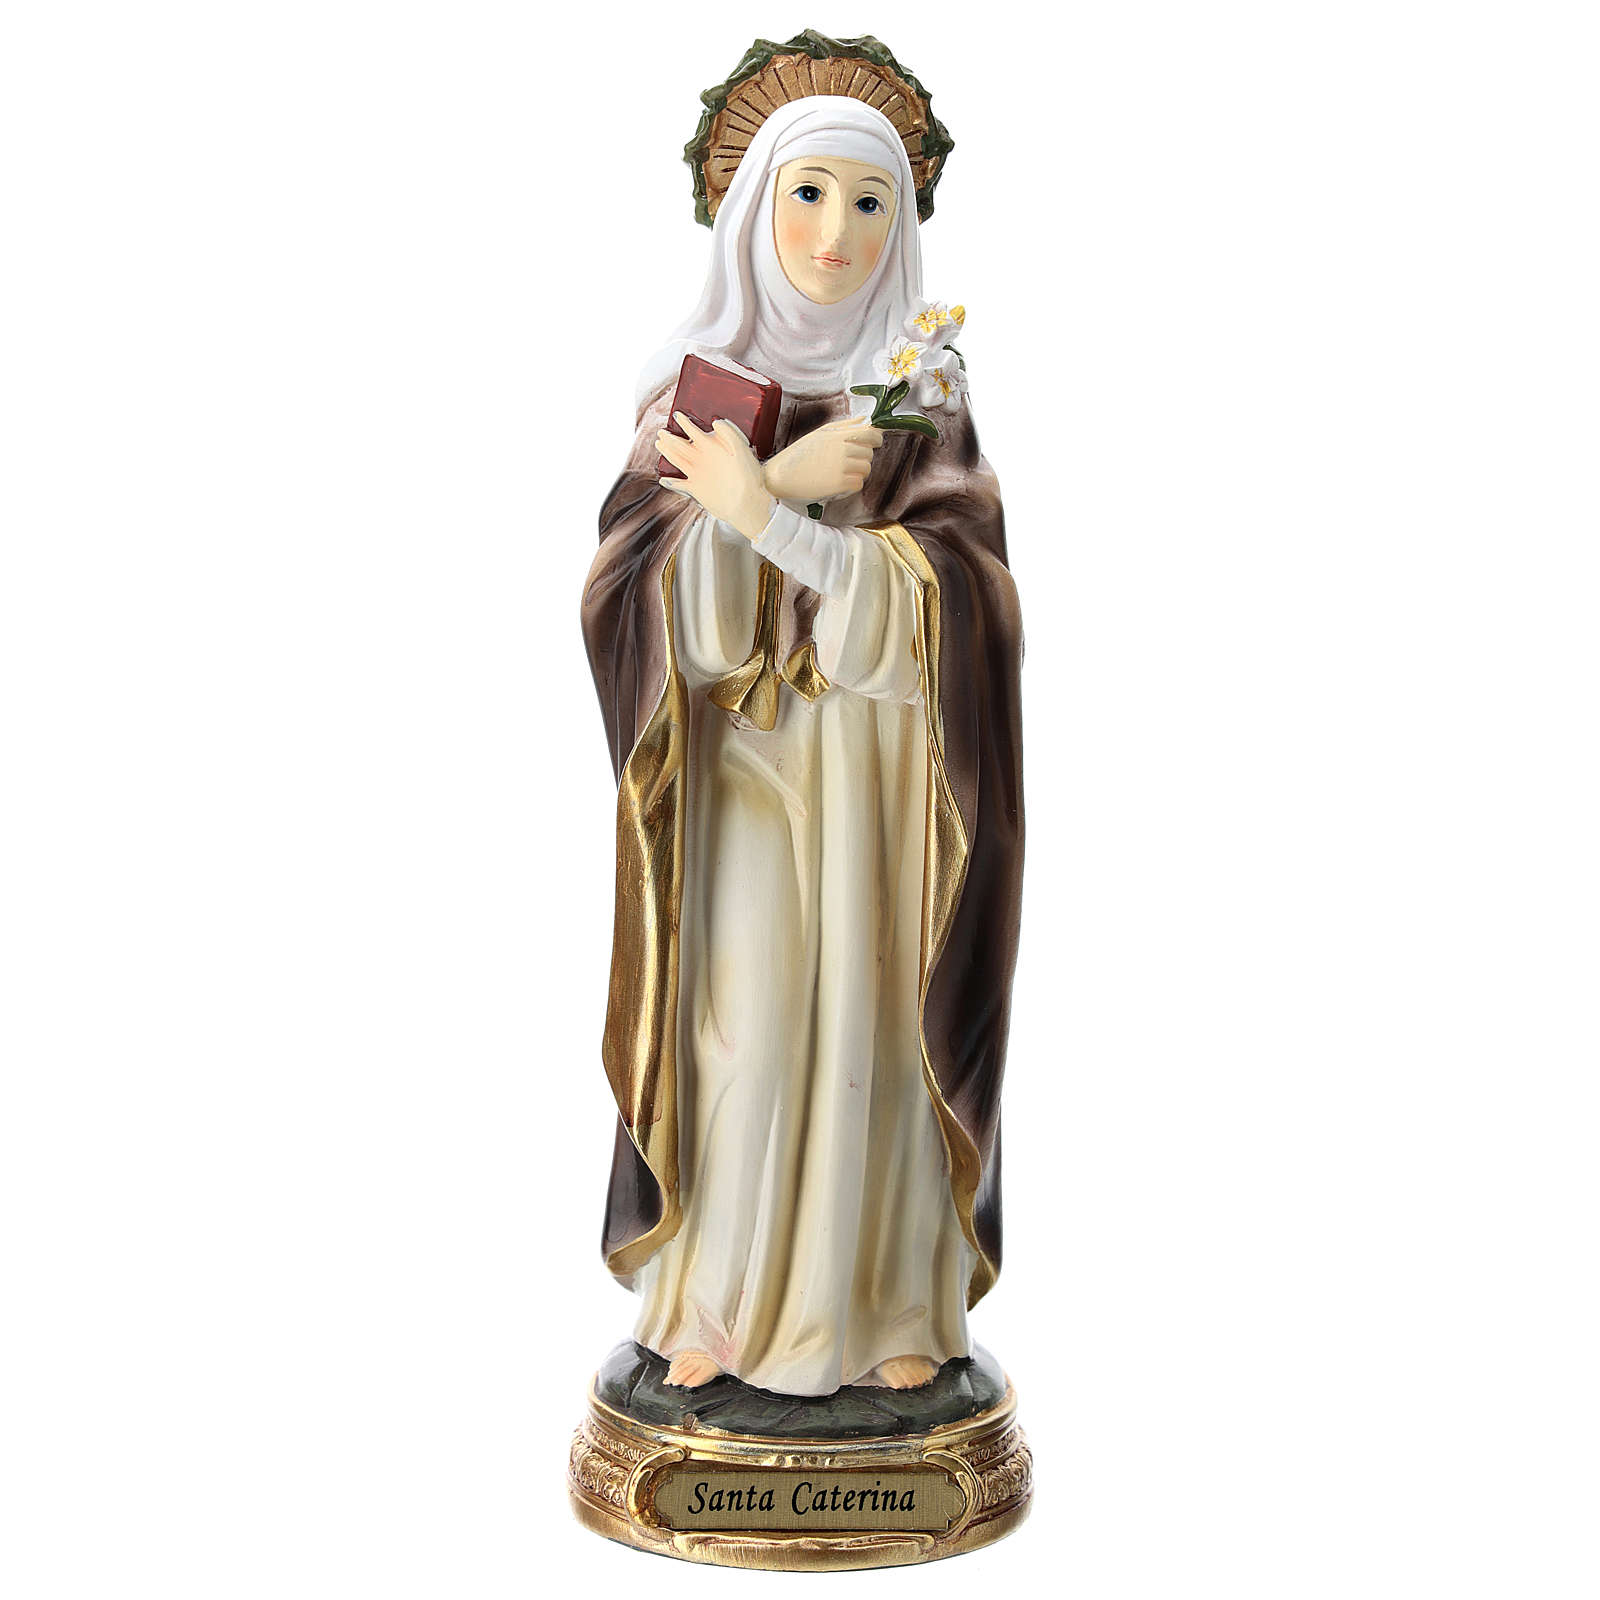 Estatua de Santa Caterina de Siena resina 20 cm 4